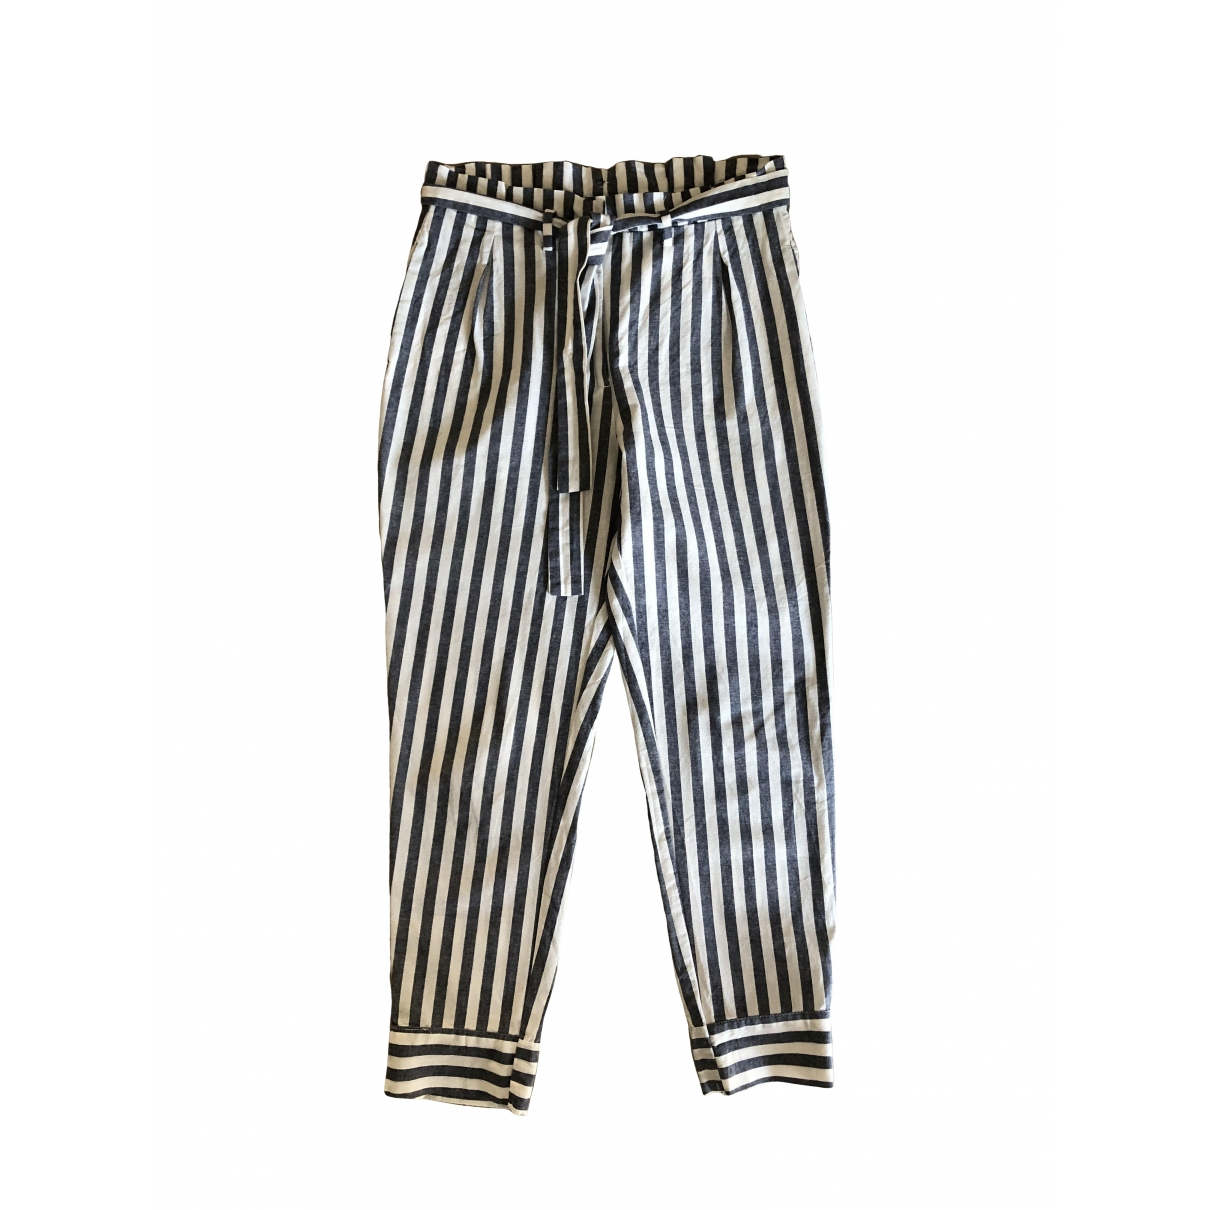 Zara \N Multicolour Cotton Trousers for Women XS International